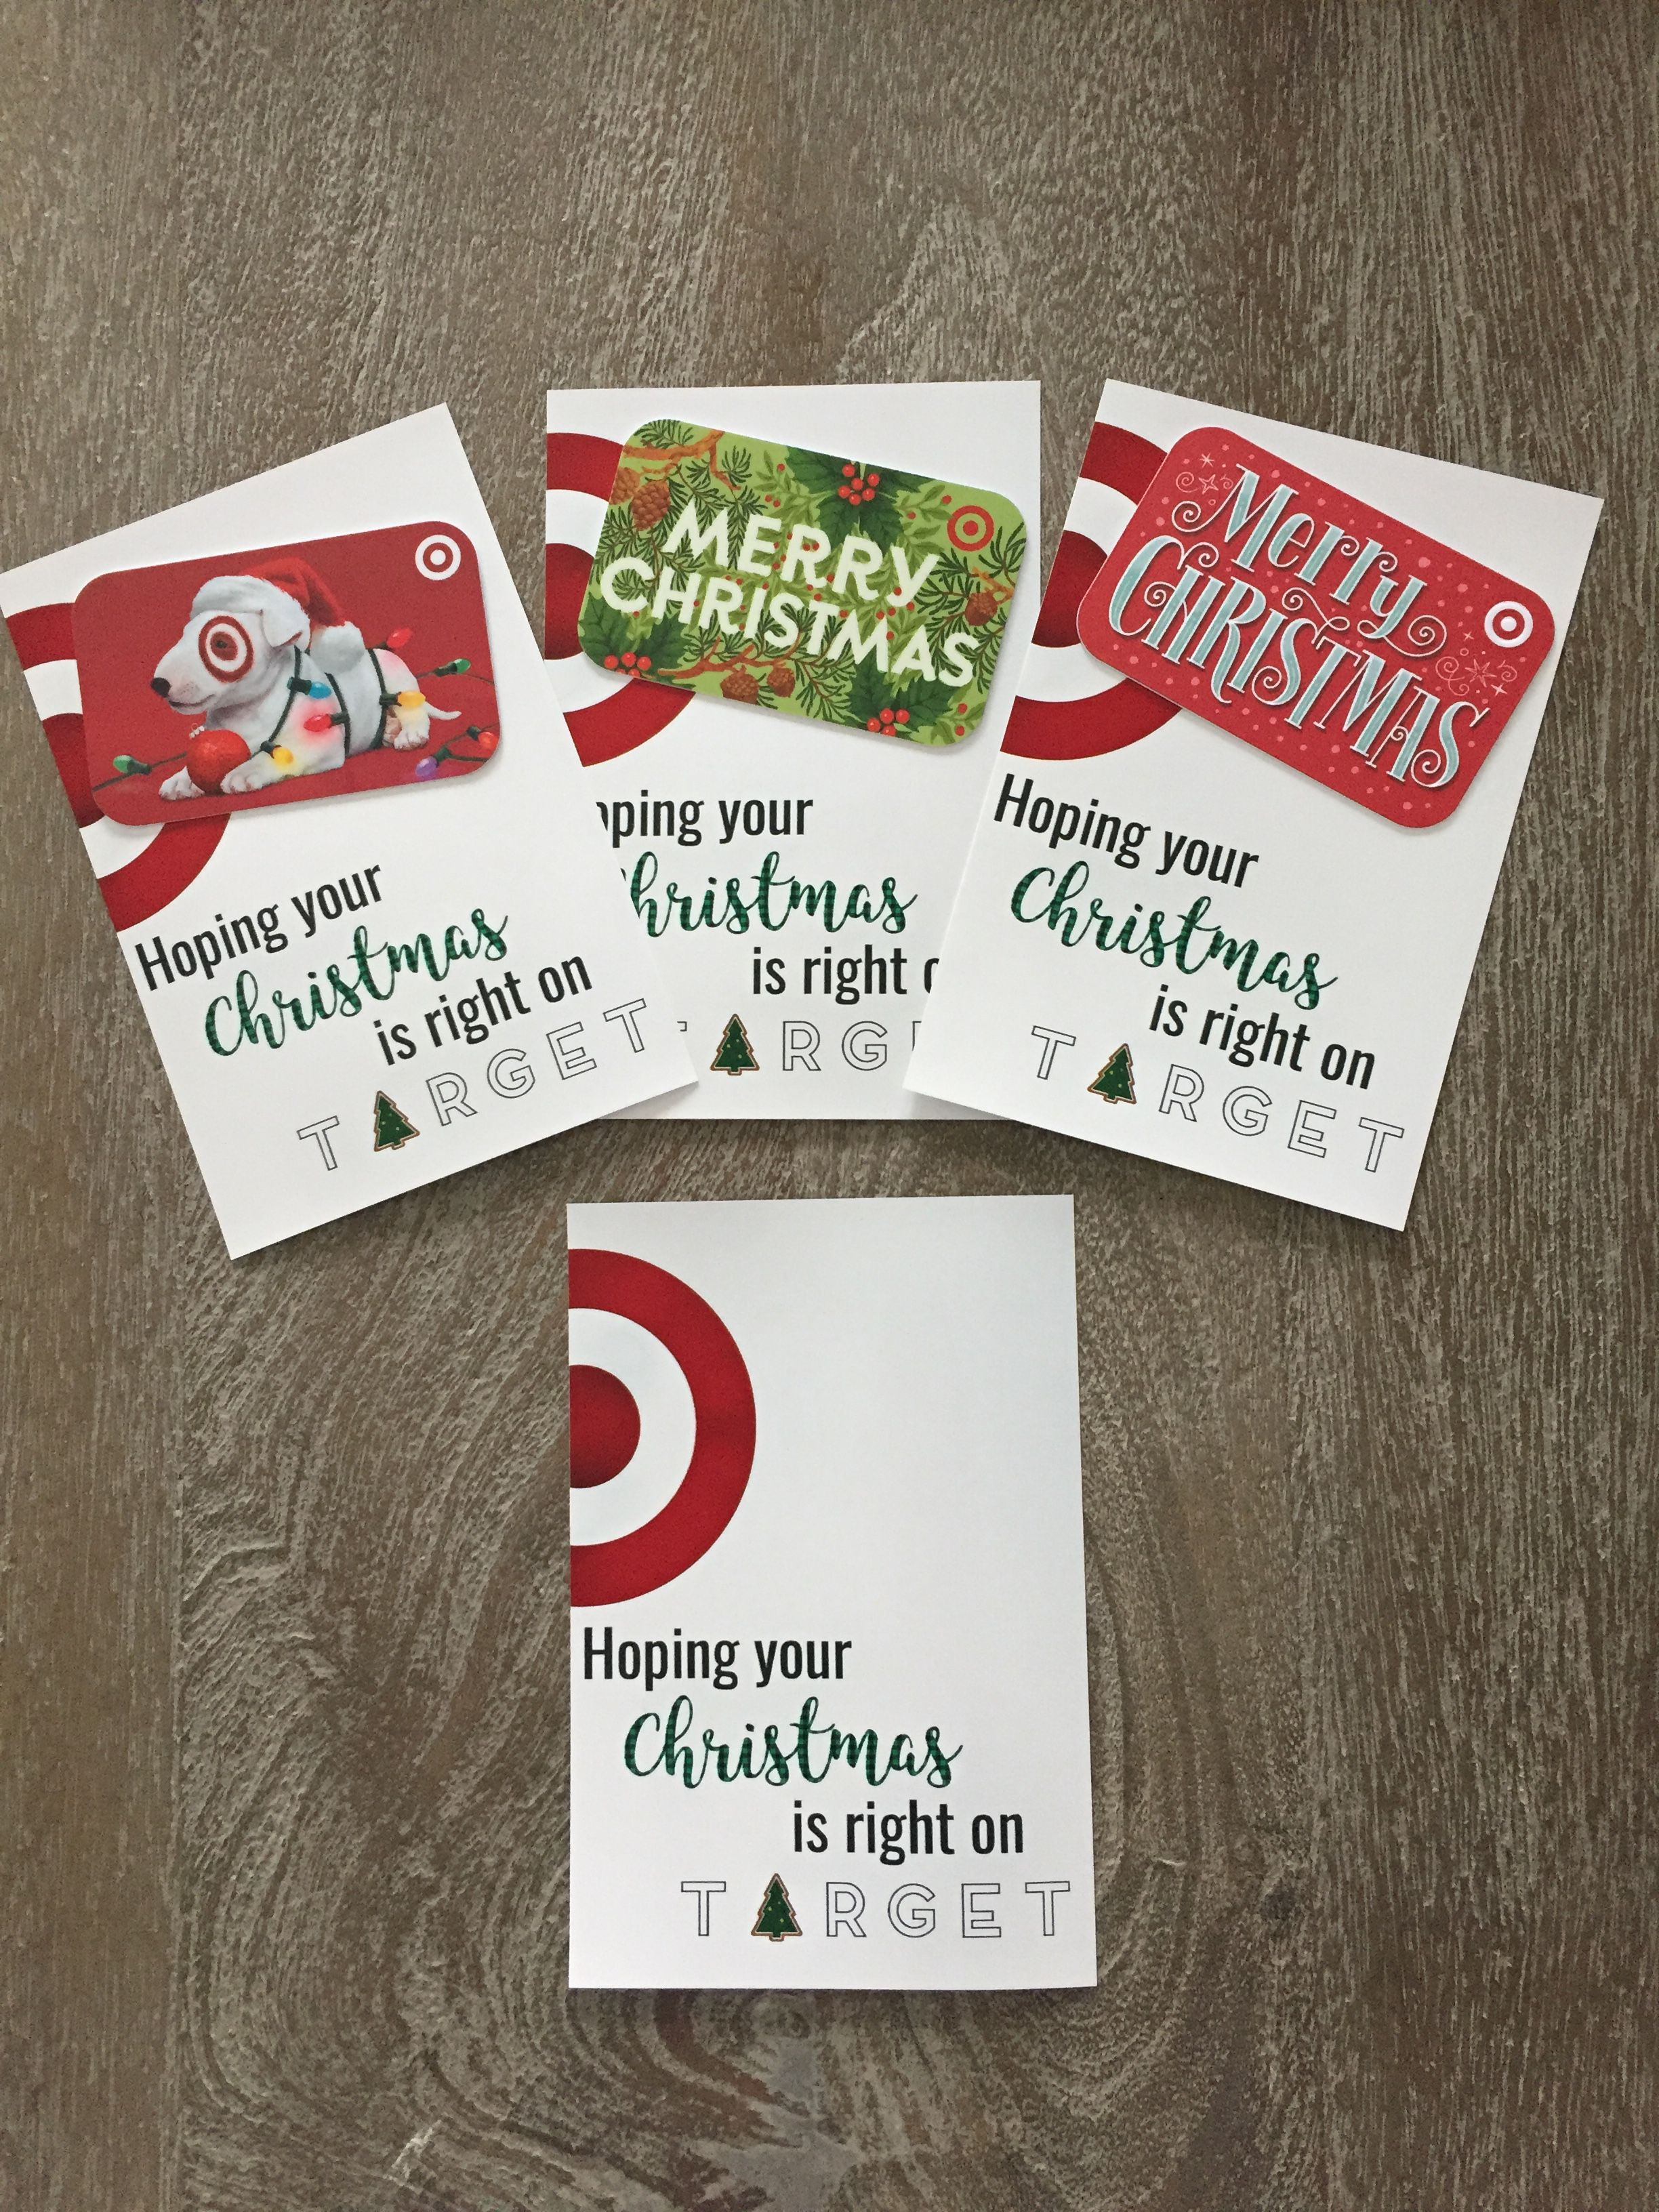 Christmas Target Gift Card Holder: Hoping your Christmas ...